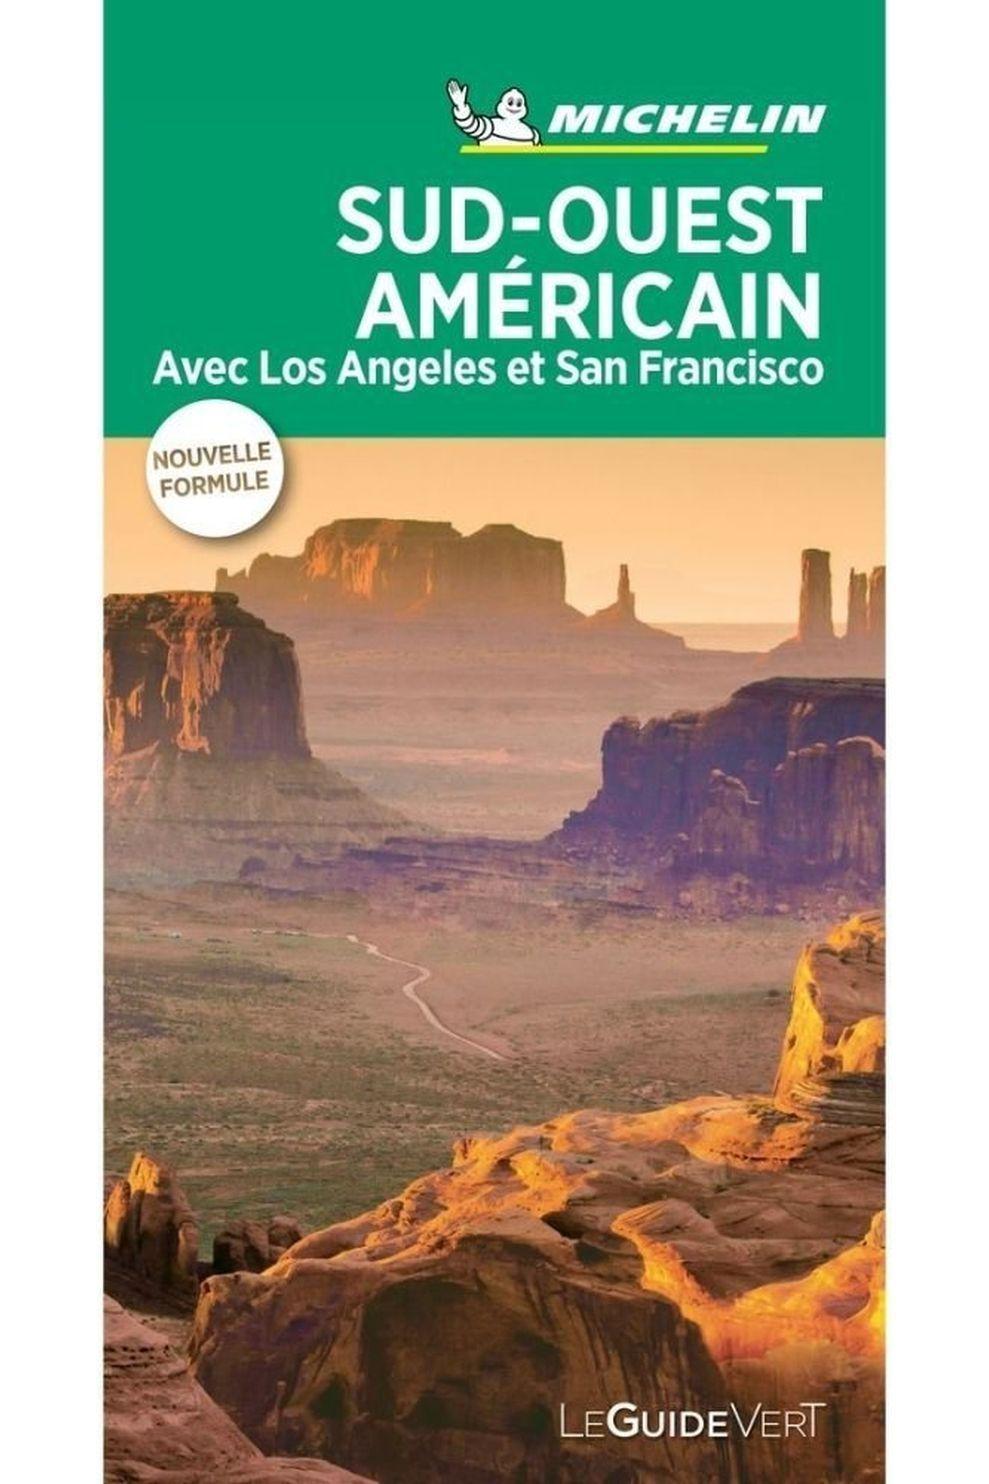 Michelin Americain-Sud-Ouest-Gvfmich:N03/2017 - 2019